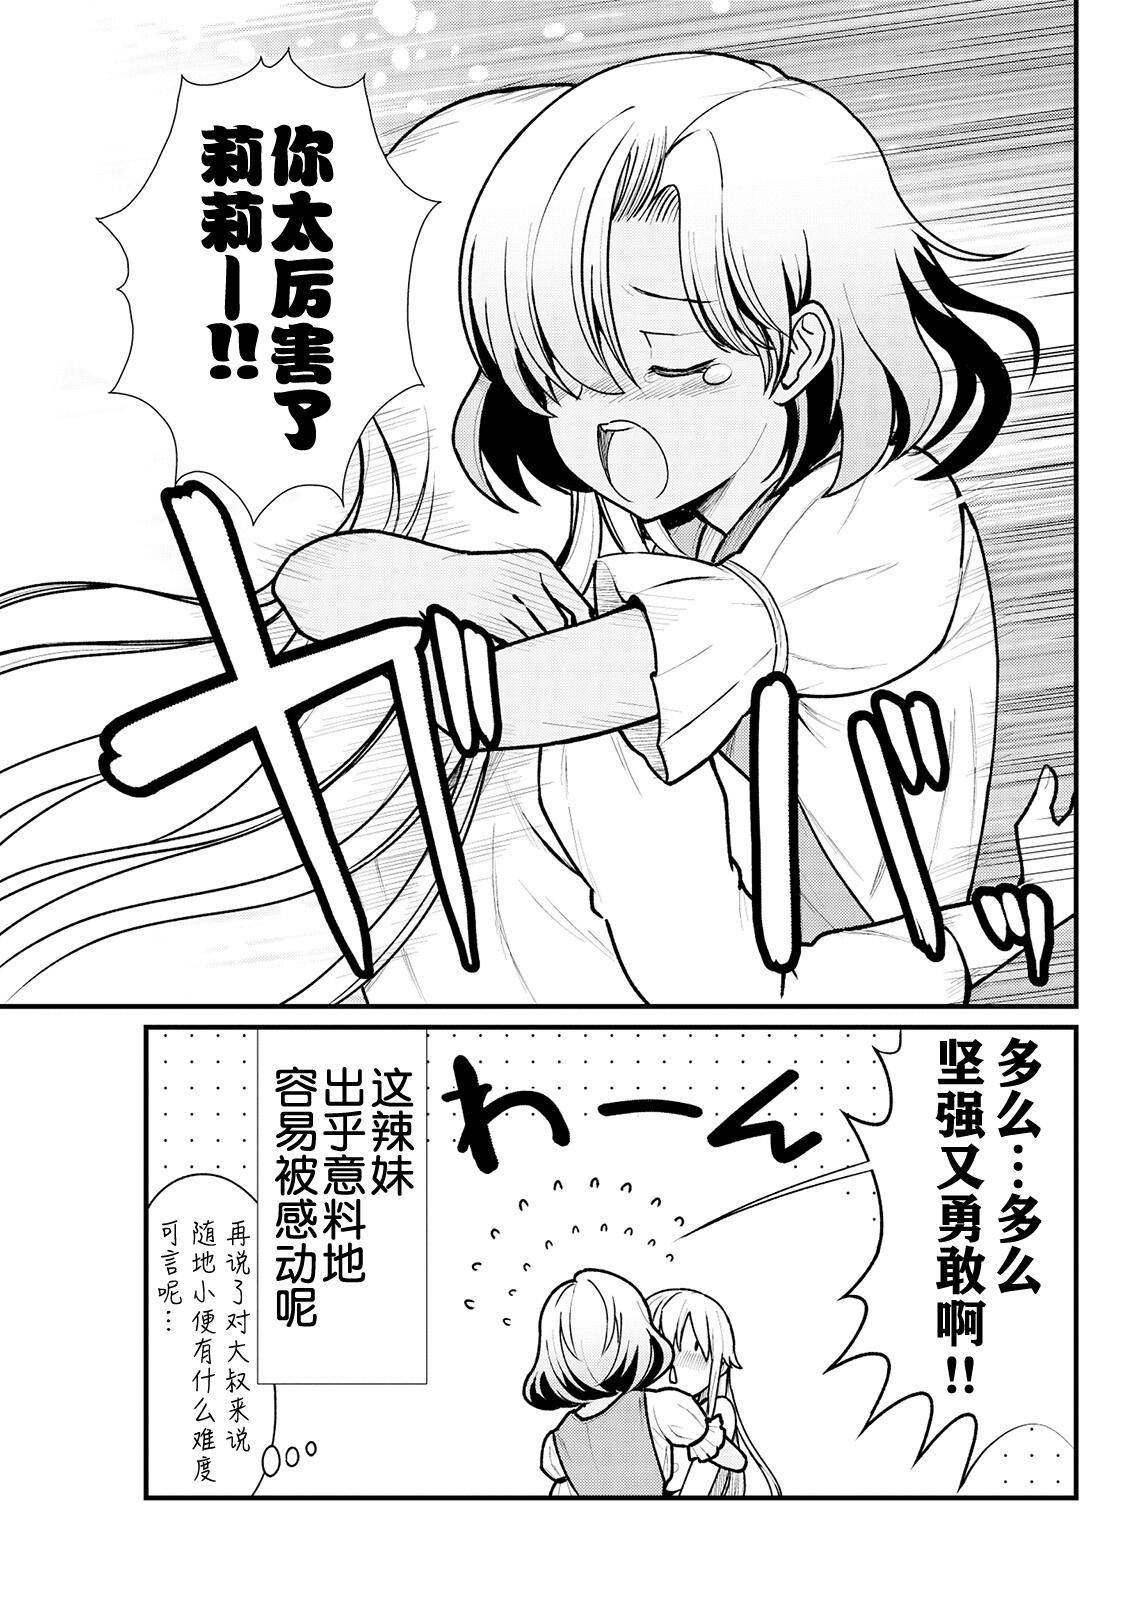 kuxtu koro se no hime kisi to nari, yuri syoukan de hatara ku koto ni nari masi ta. 3 (chinese)(鬼畜王汉化组) 17